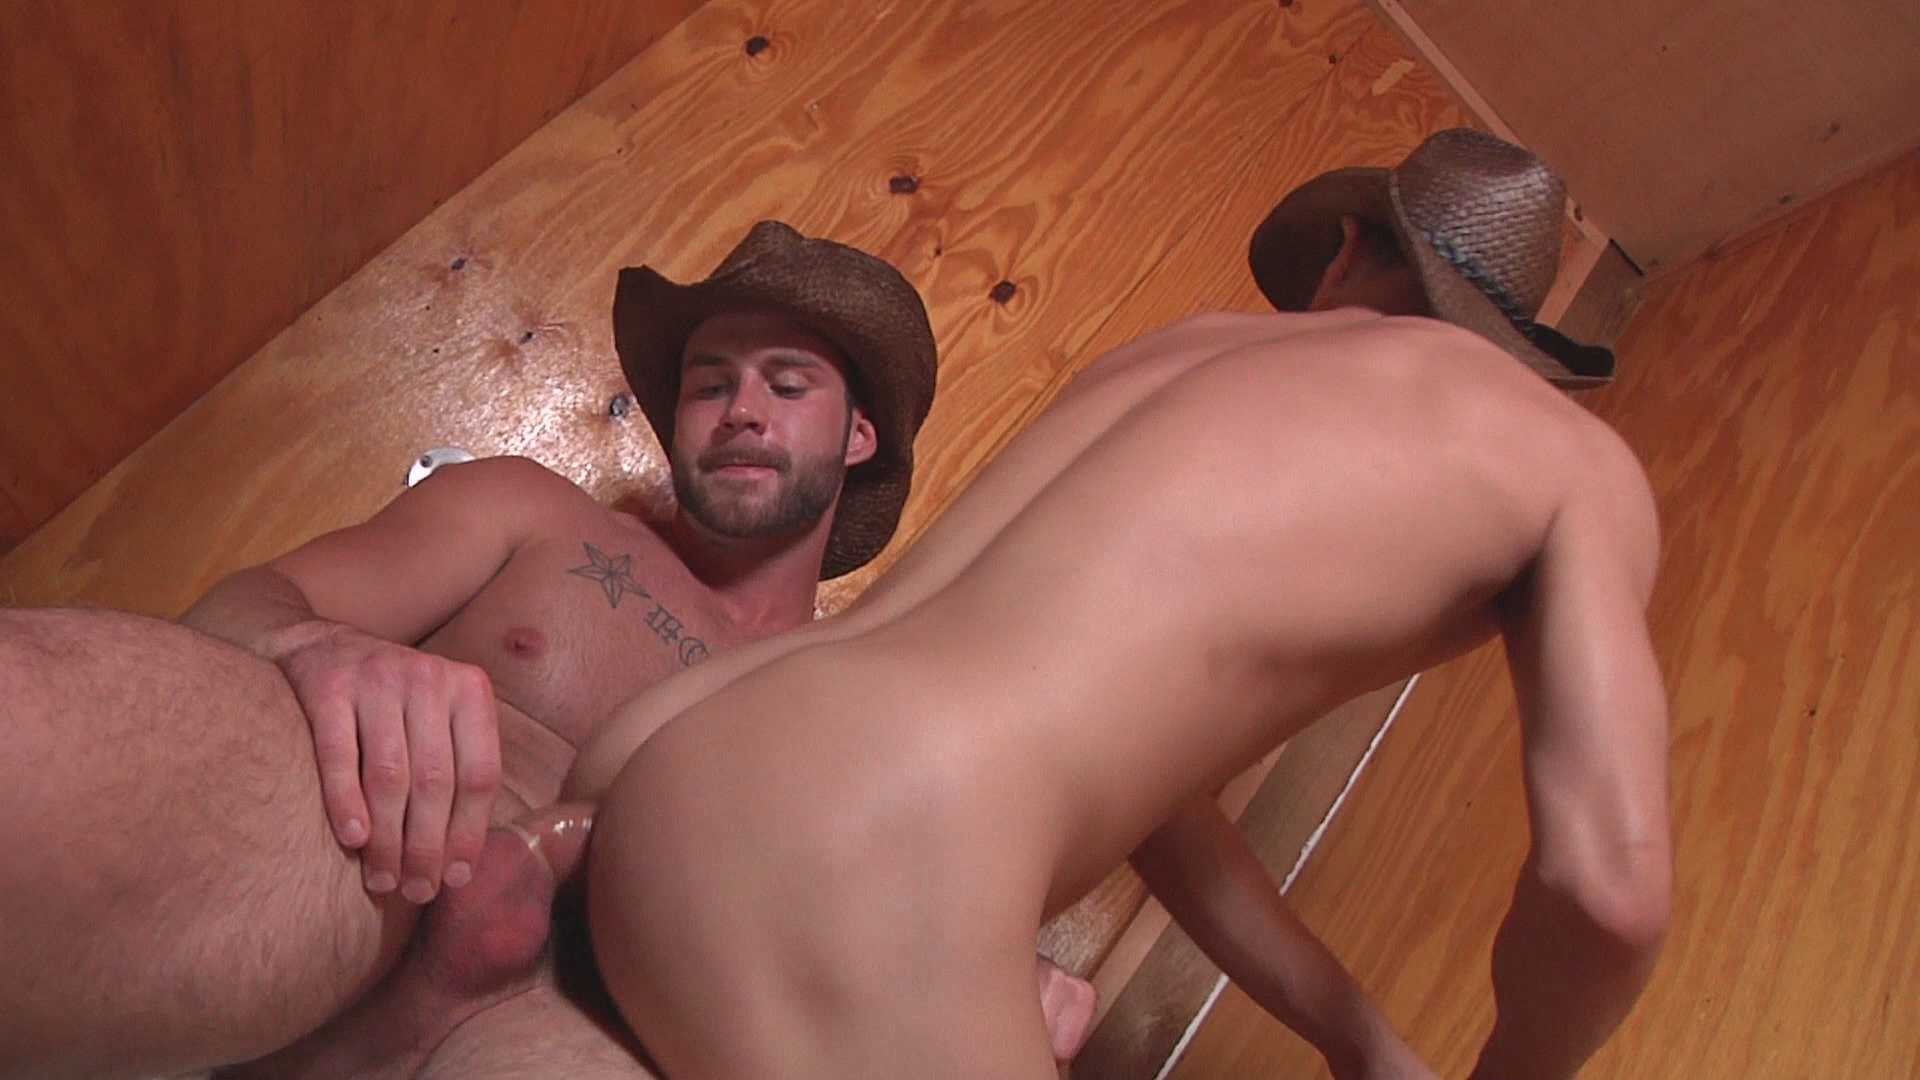 Going West Gay Porn Mansurfer